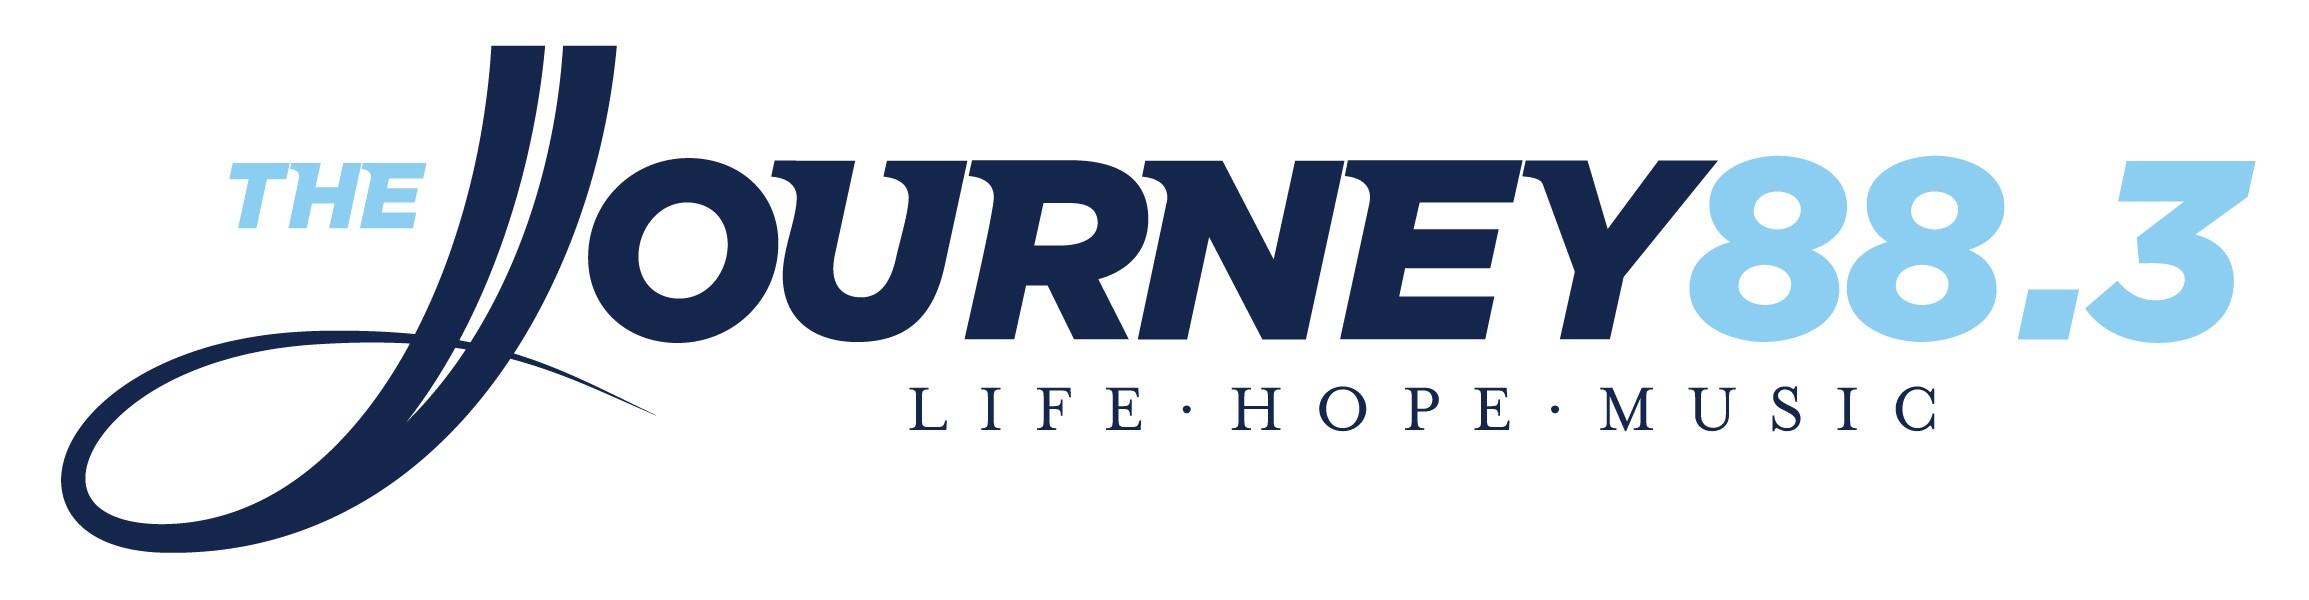 Journey logo with 883